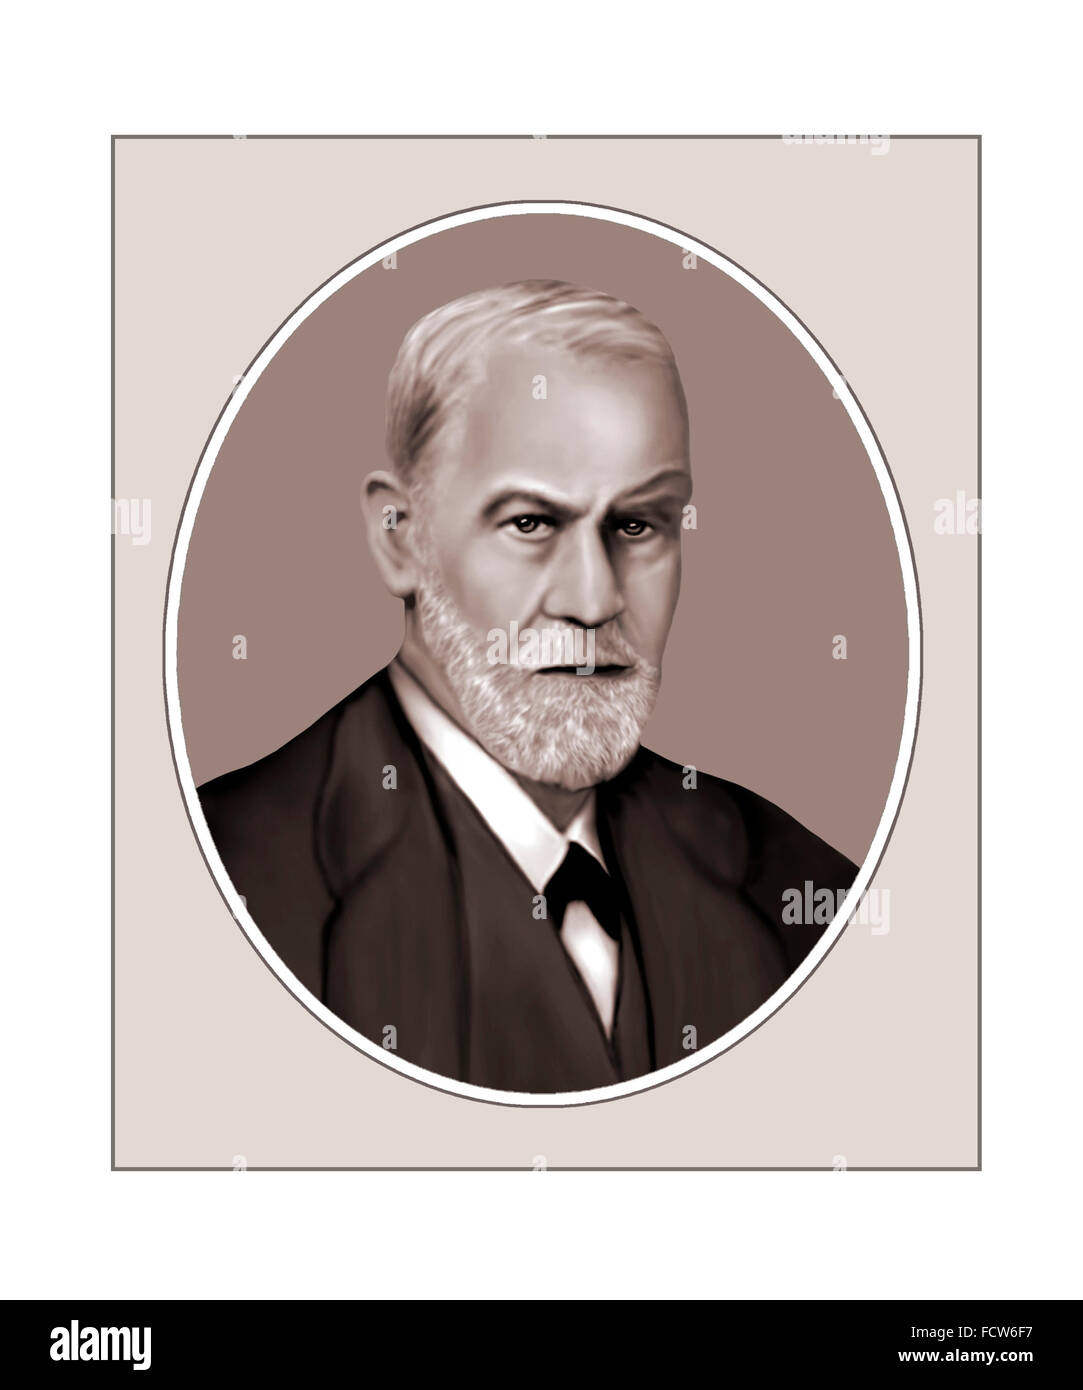 Sigmund Freud, Austrian Psychoanalyst, Portrait - Stock Image